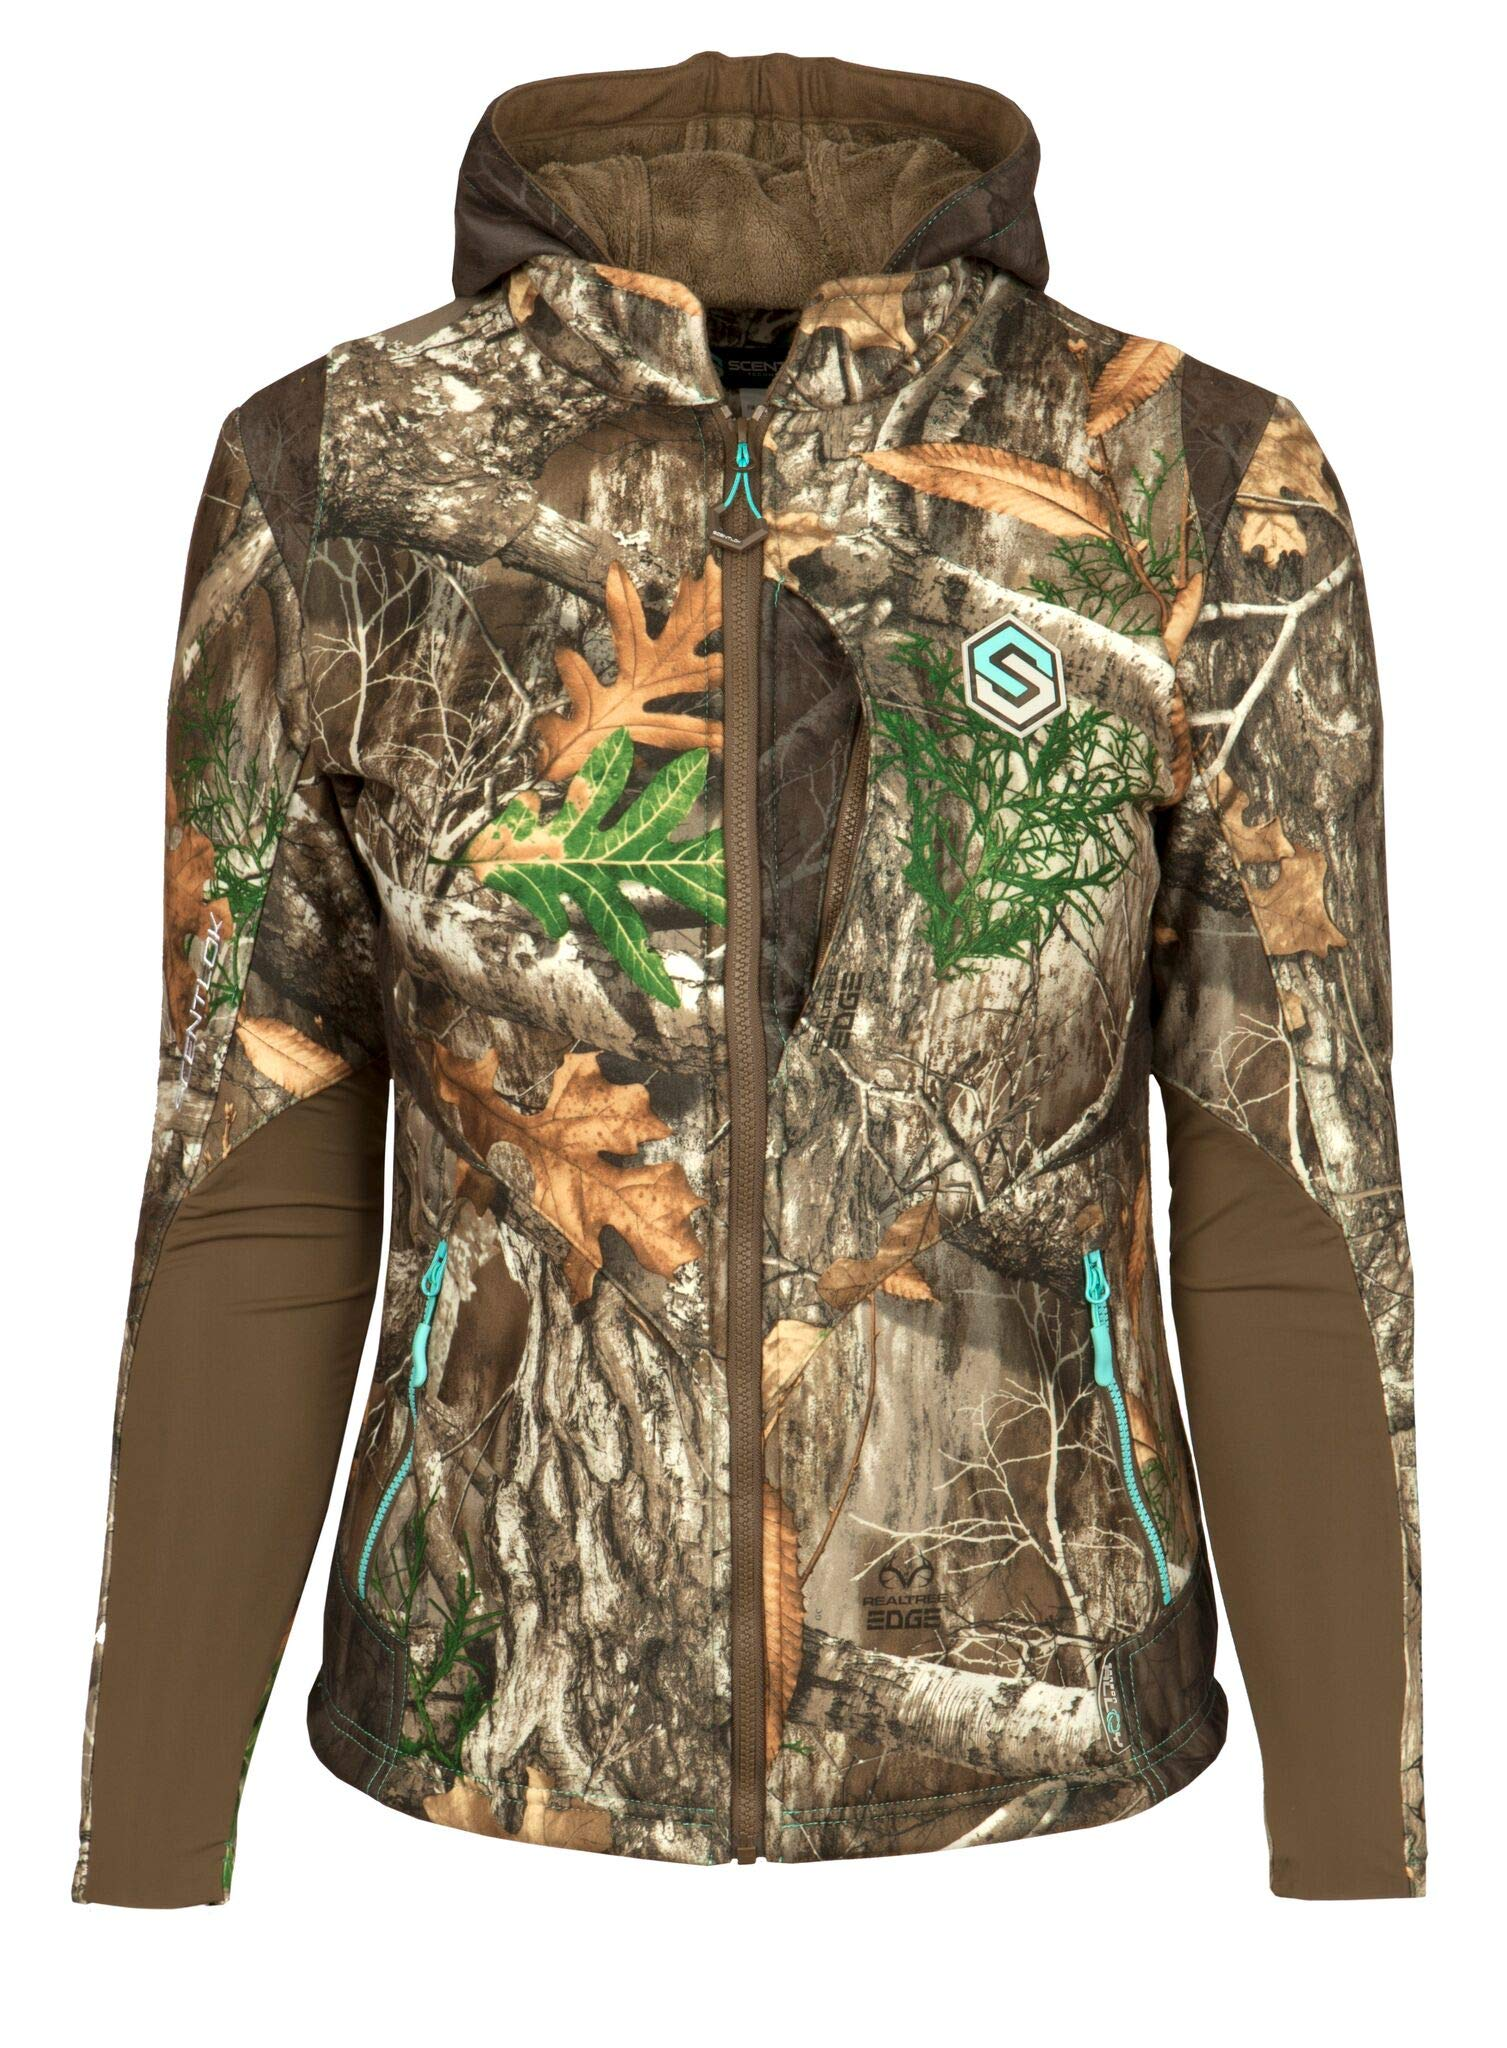 ScentLok Women's Full Season TAKTIX Hunting Jacket, Realtree Edge, M by ScentLok